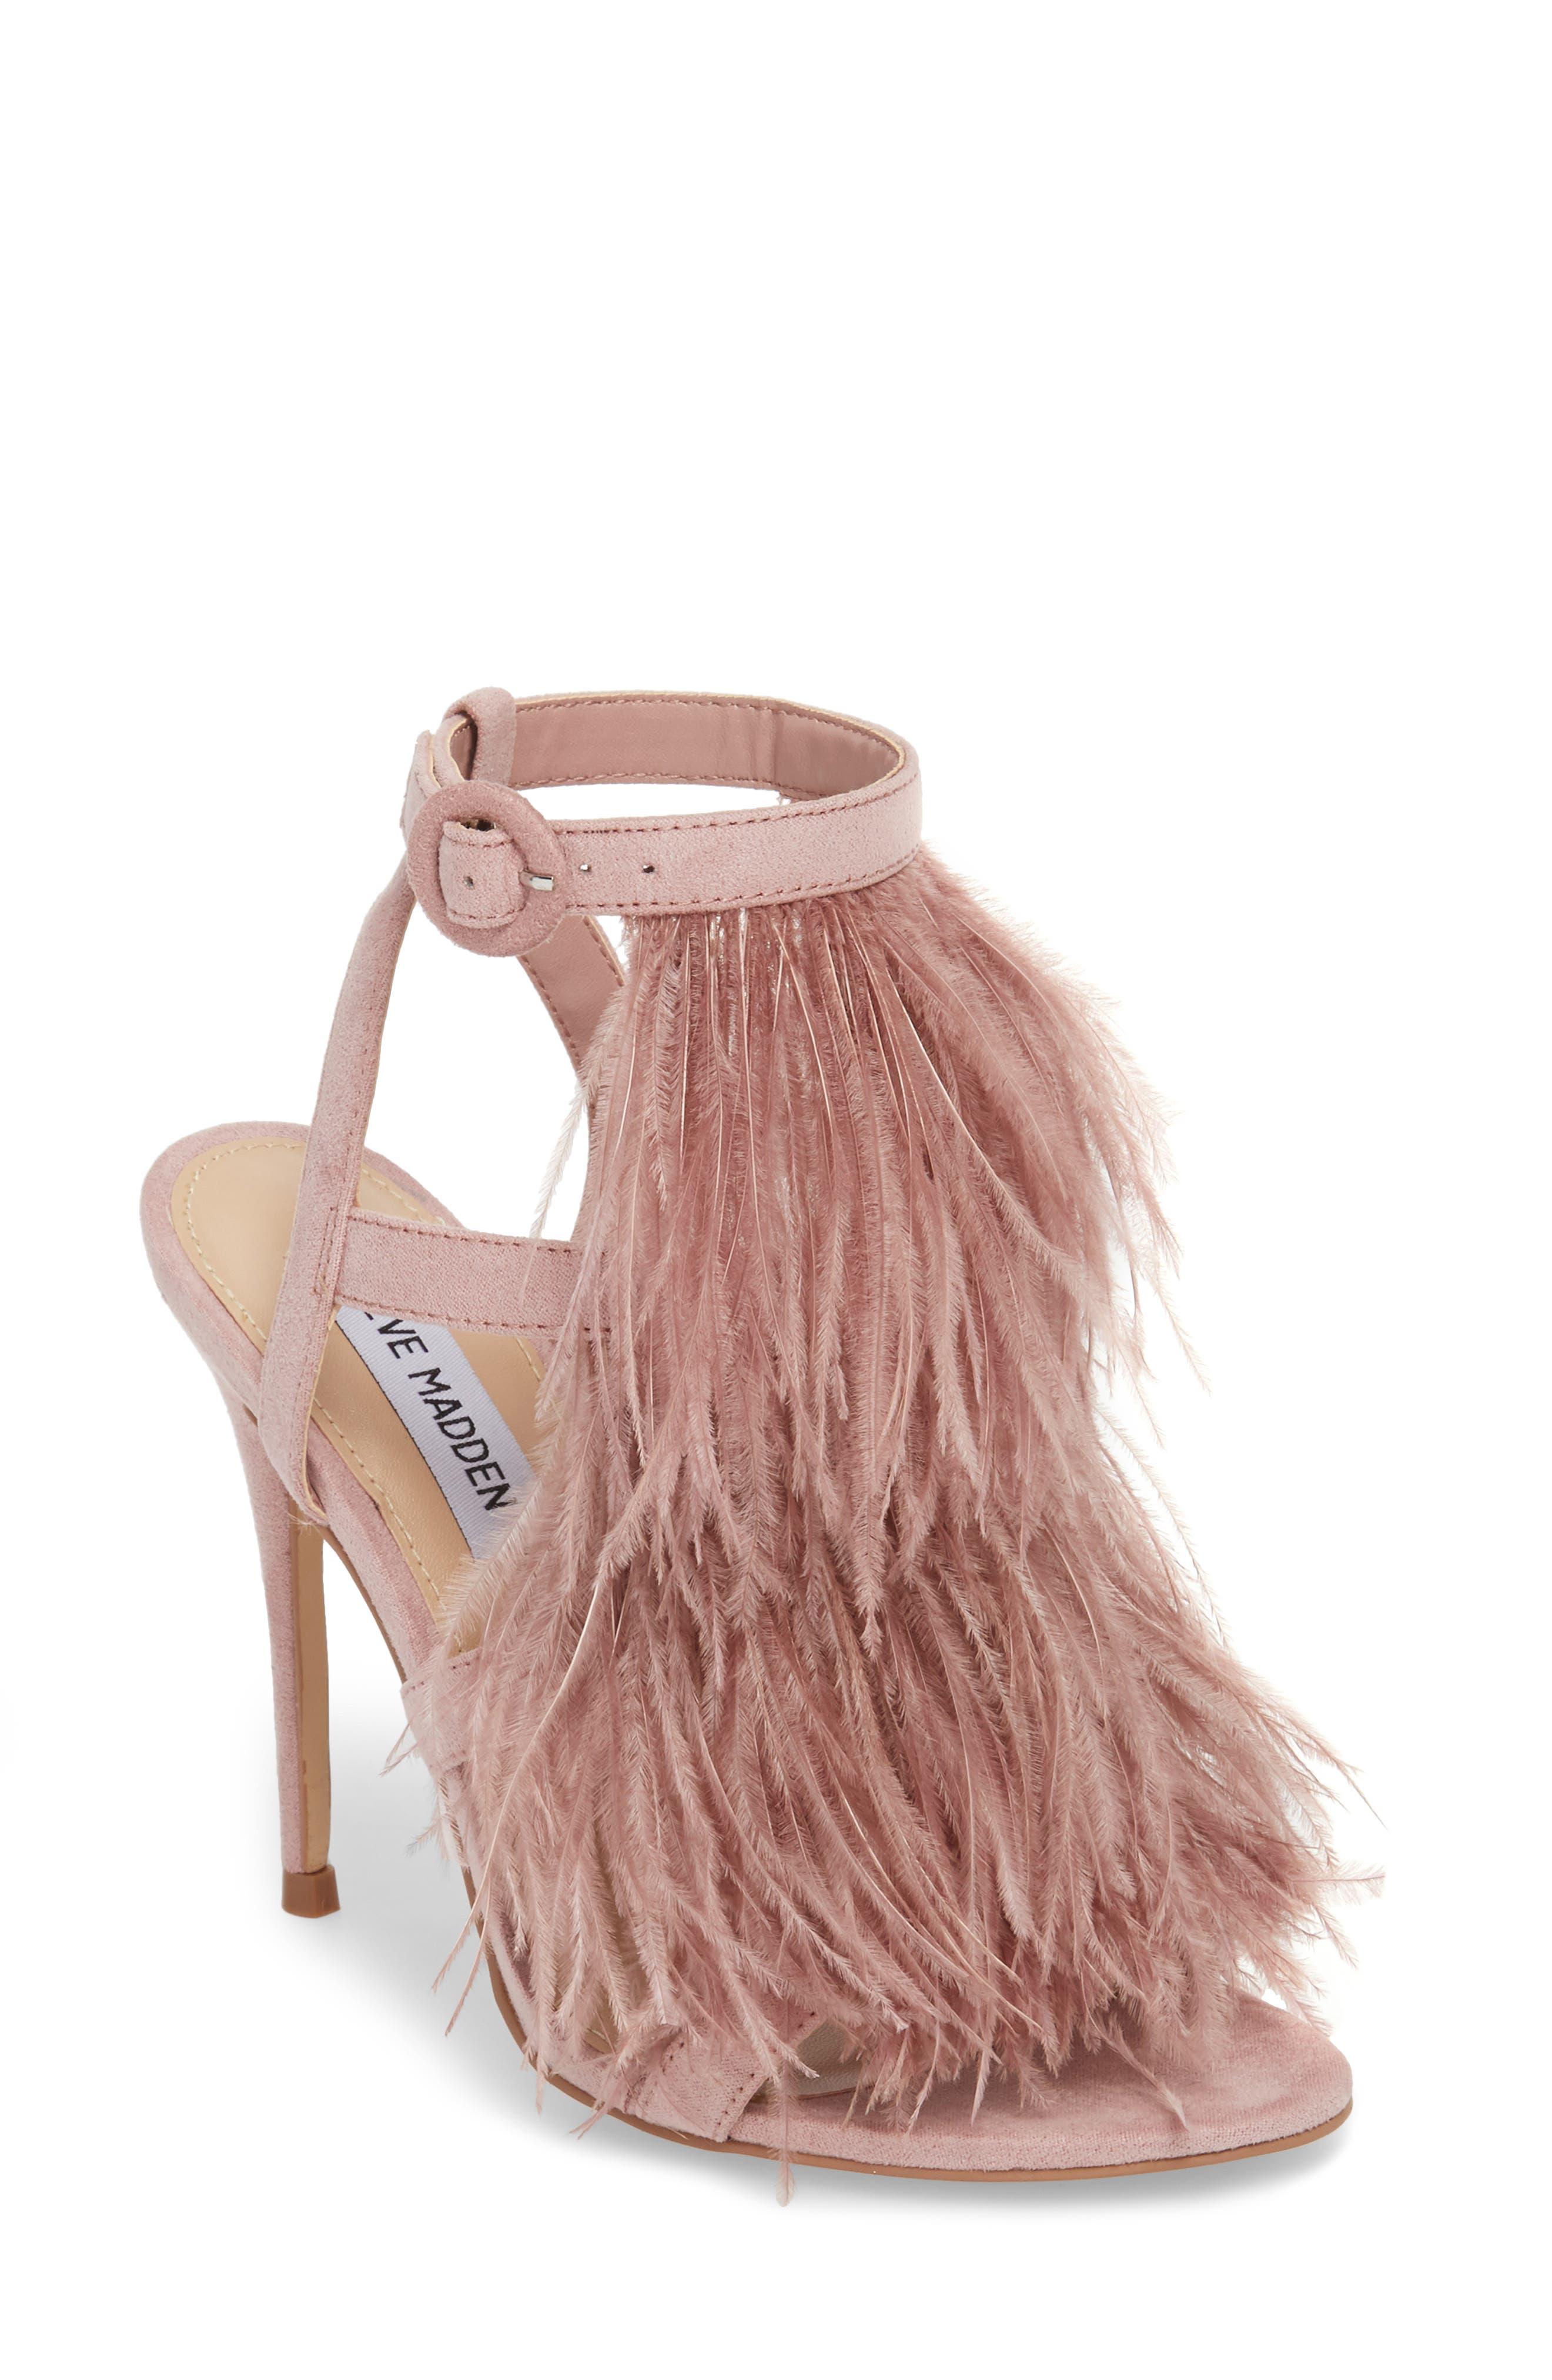 Steve Madden Fefe Feather Sandal, Pink